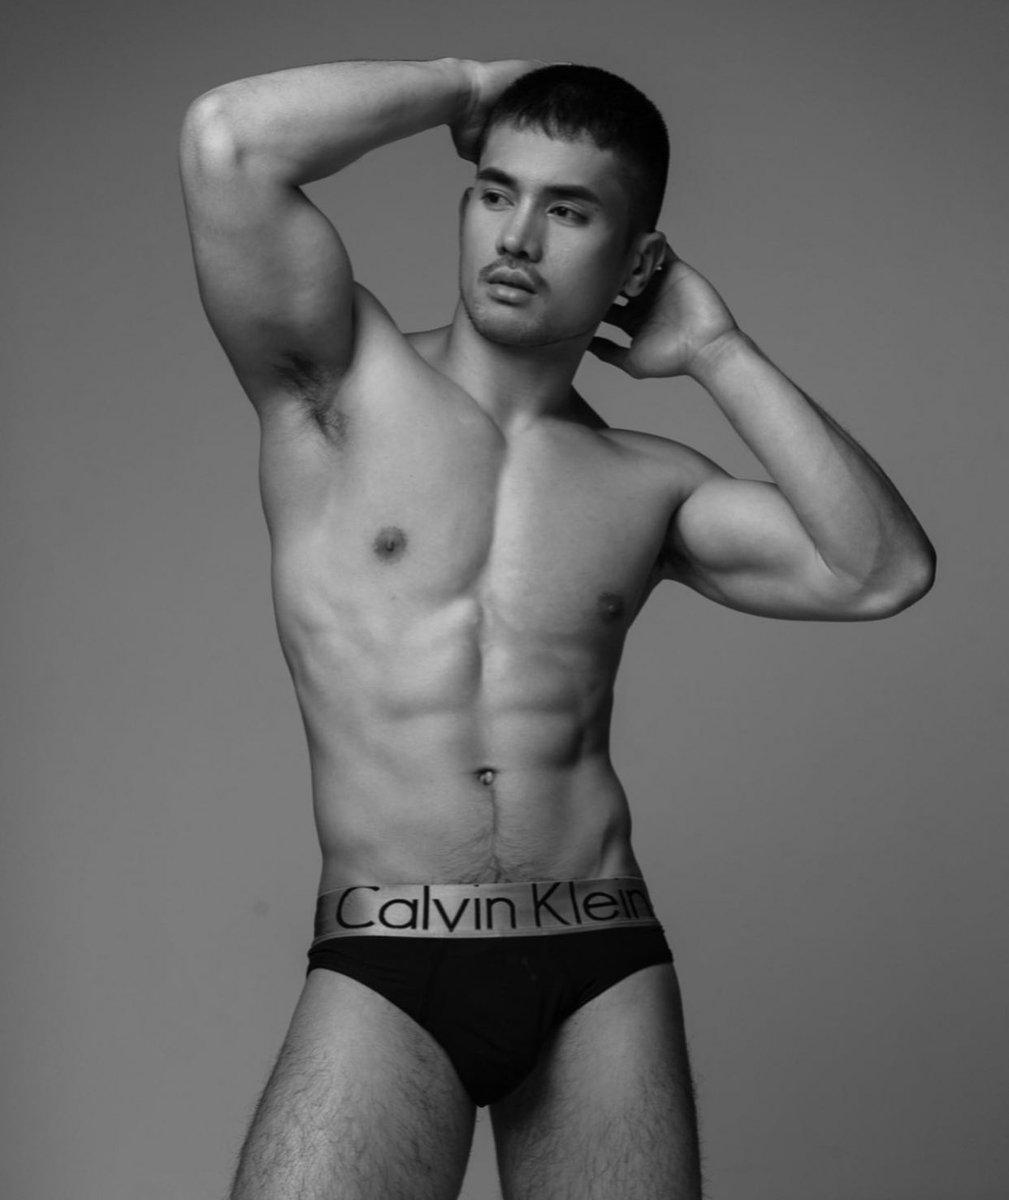 IG: baeph.spotted #baephspotted  #pinoy  #sexypinoy #pinoybae #pinoymodel  #model #malemodel #pinoy #pinoymodel #pogi #bae #baeph #hotpinoy #pinoyunderwear #cutepinoy #filipino #likesforlikesback #likesforlikes https://t.co/AaRA8I62jX